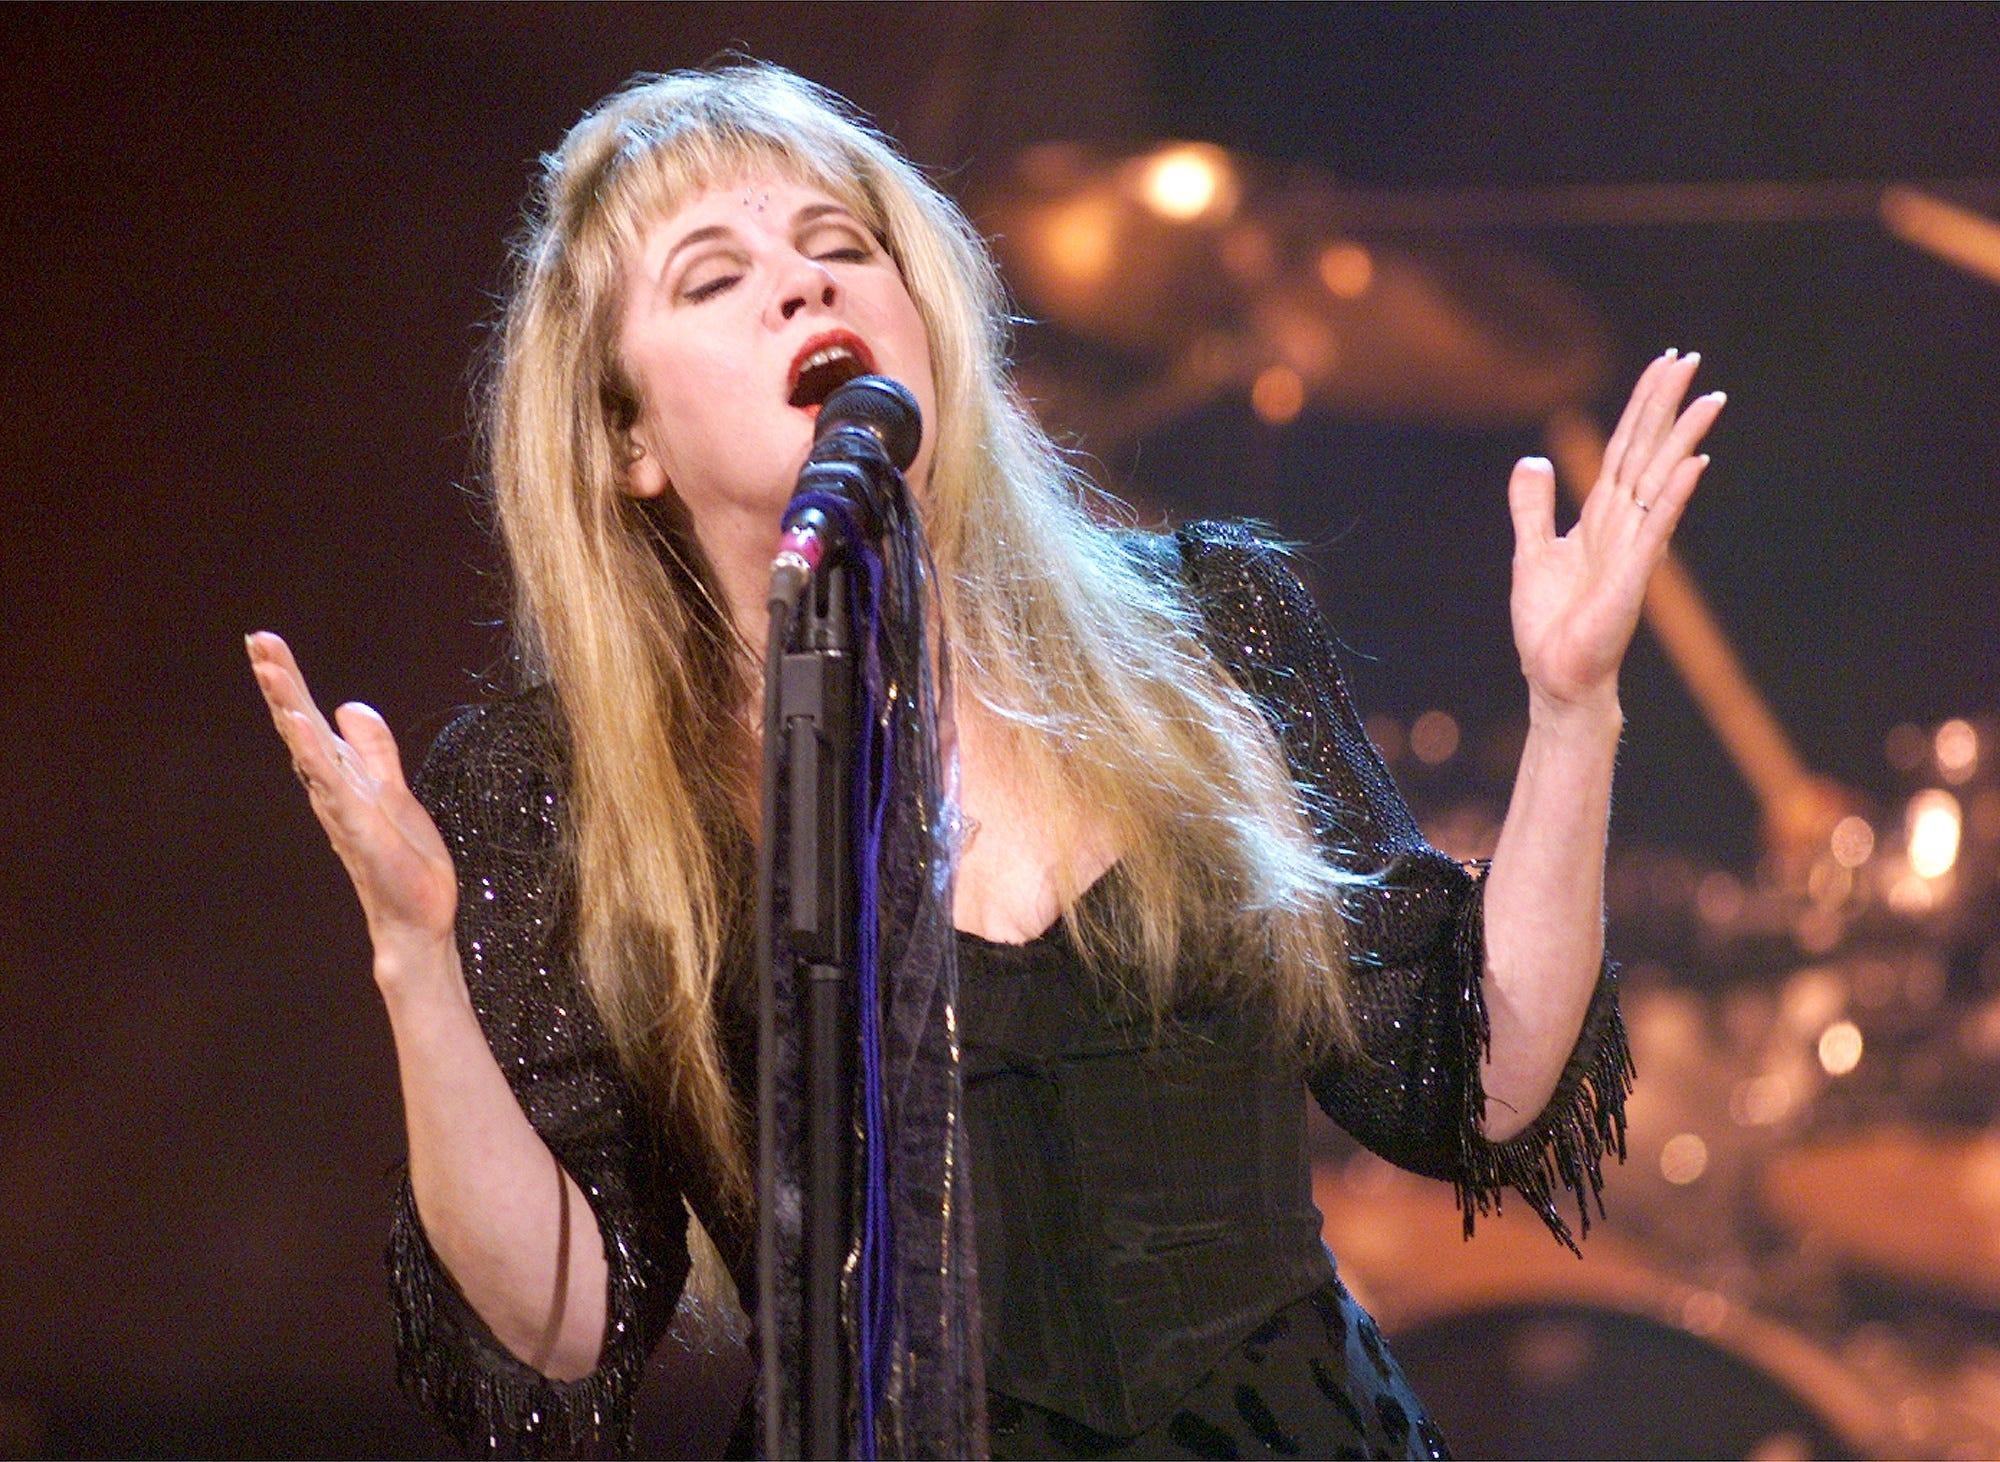 Stevie Nicks on Phoenix:  I m so sorry I don t live here anymore